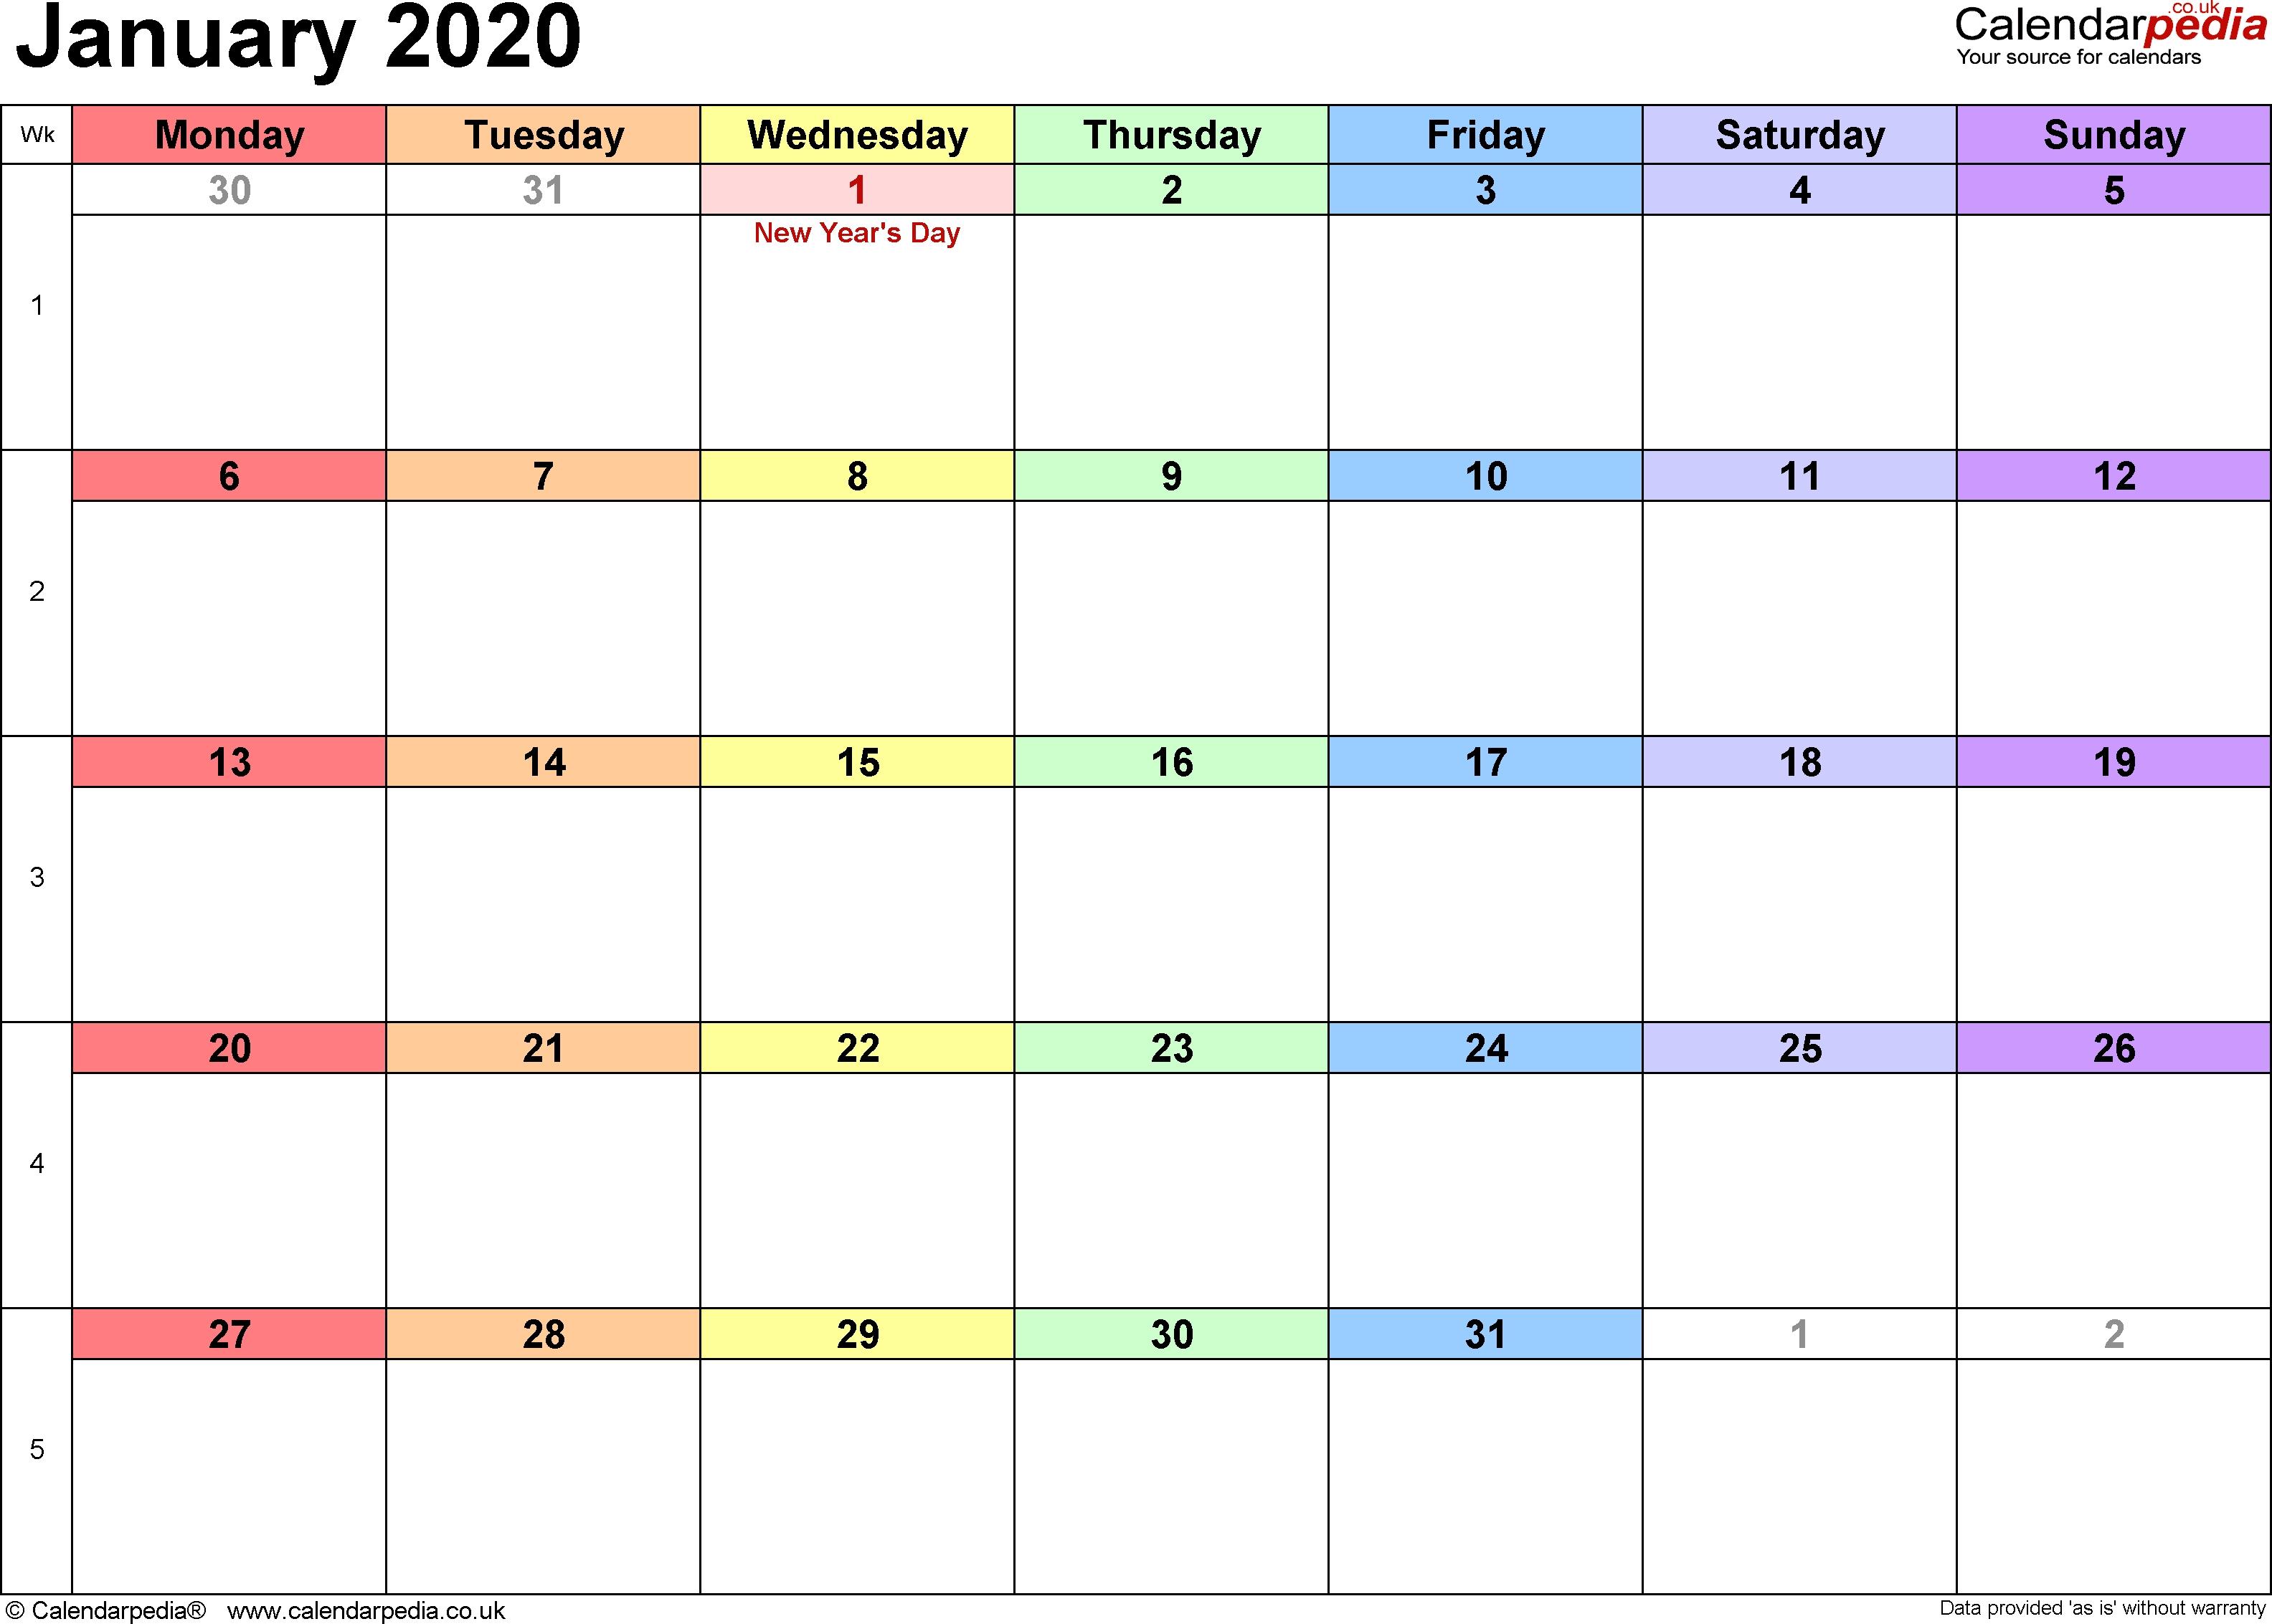 Calendar January 2020 Uk, Bank Holidays, Excel/pdf/word-January 2020 Calendar Canada